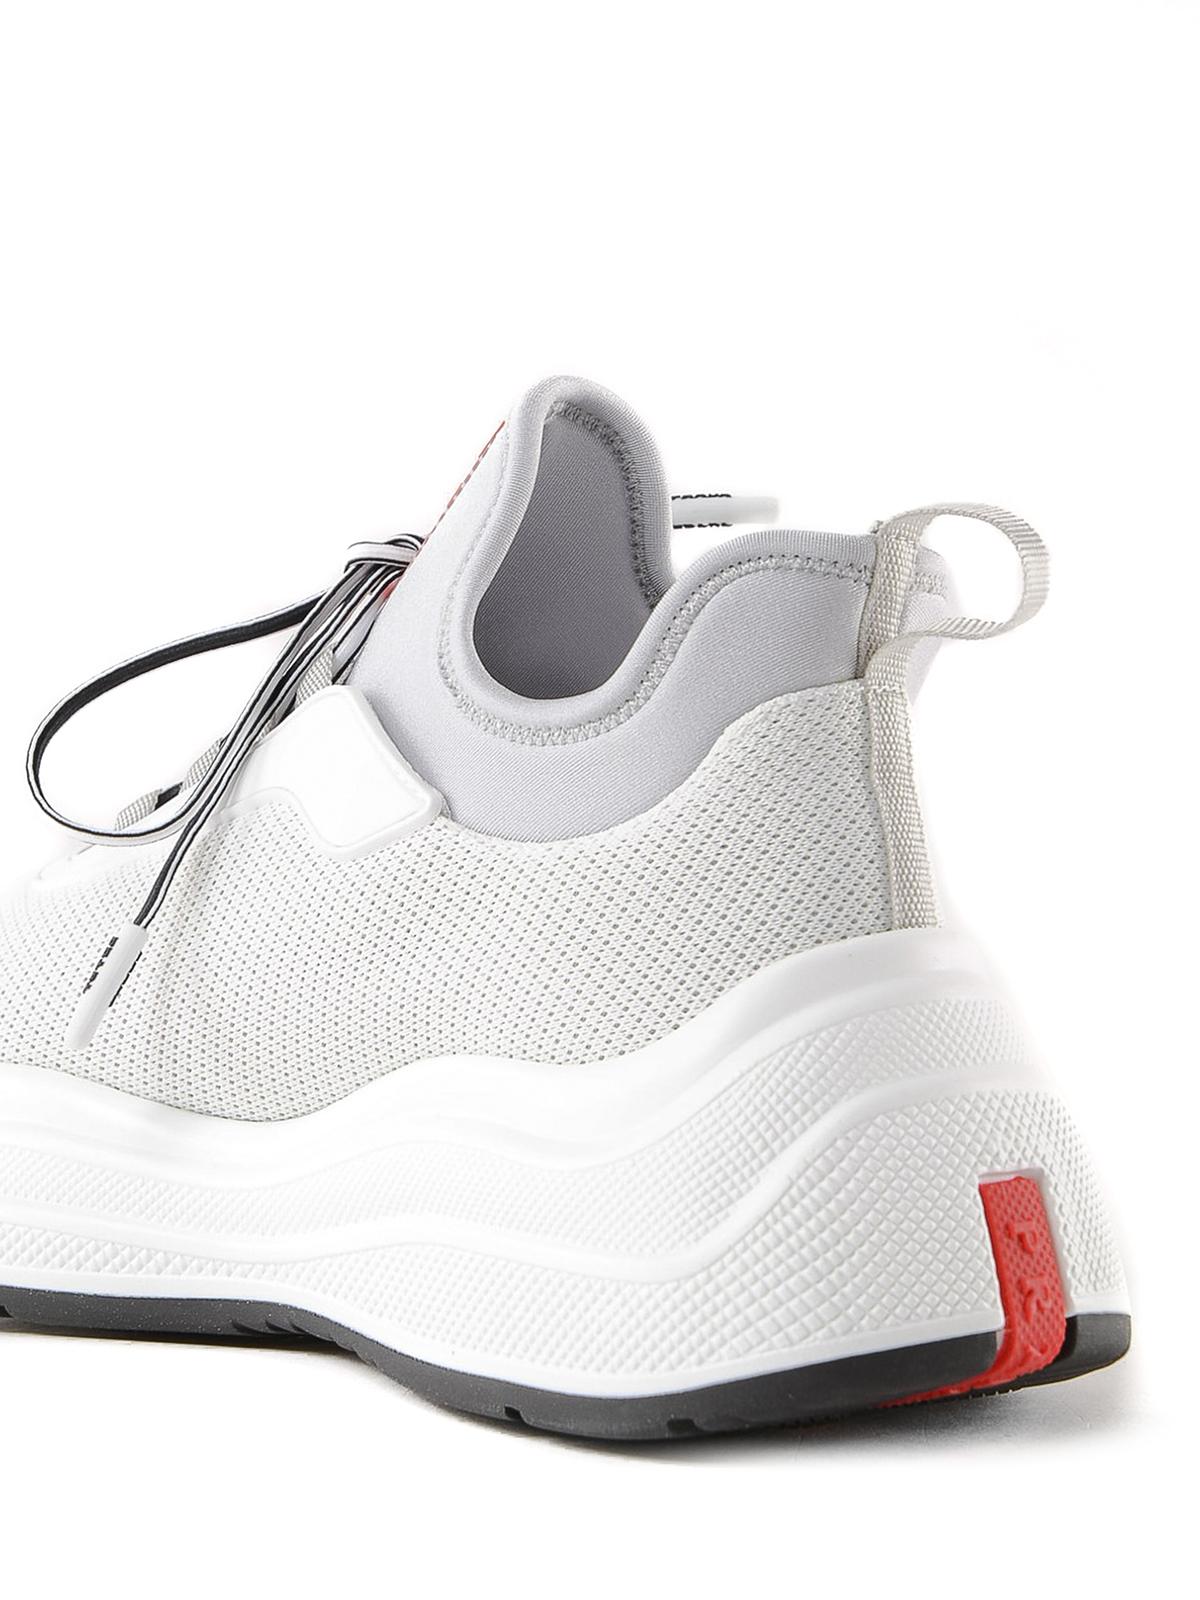 Prada - Mesh sneakers with chunky sole